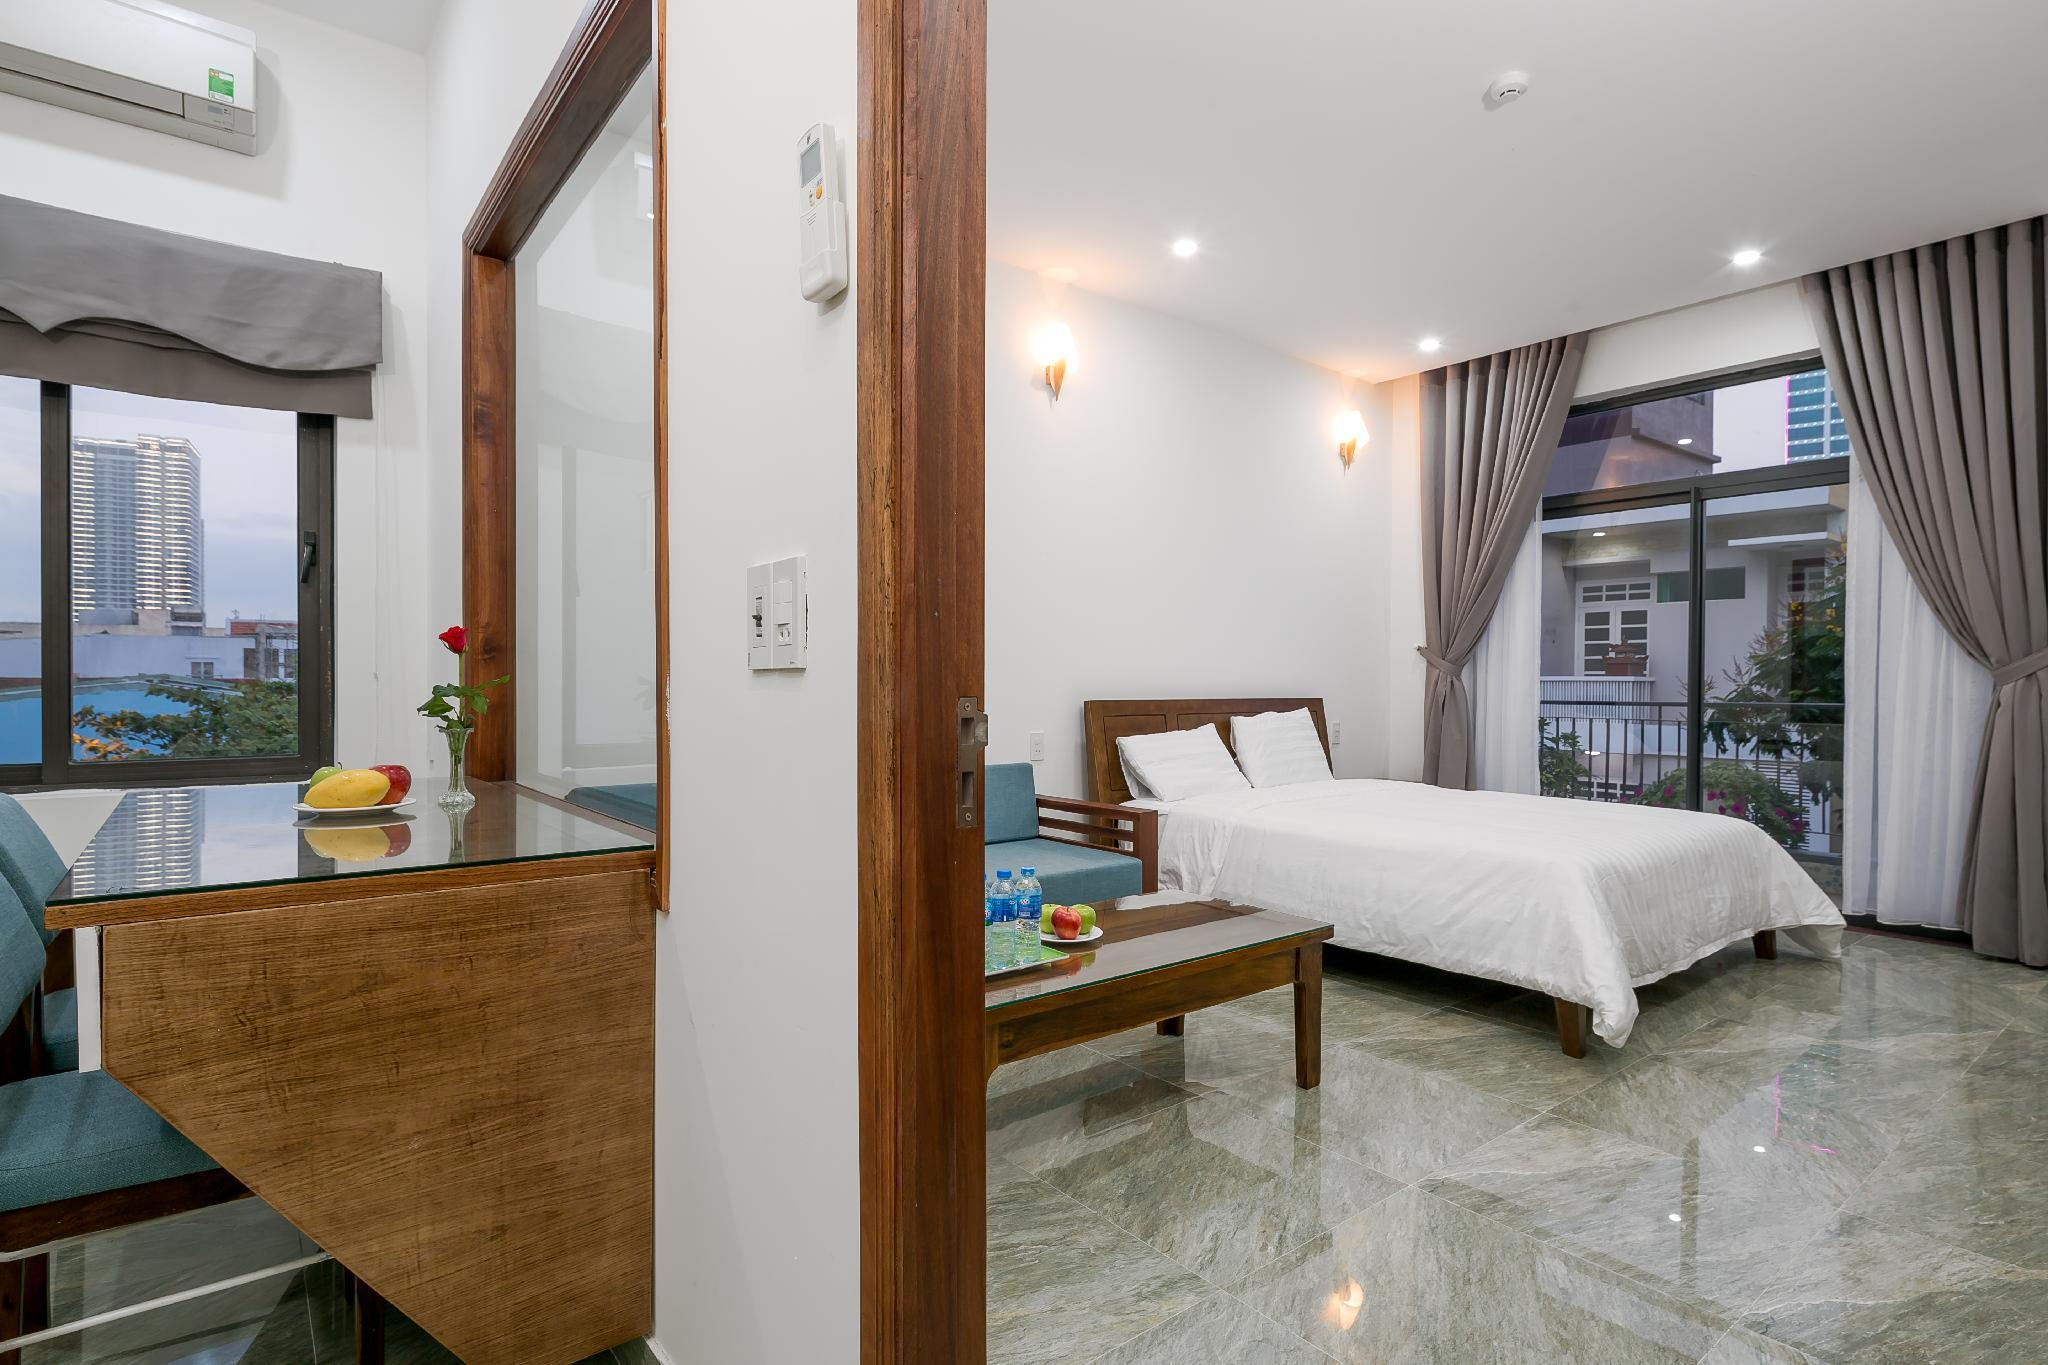 Marina Apt 1 Bedroom With Full Furniture